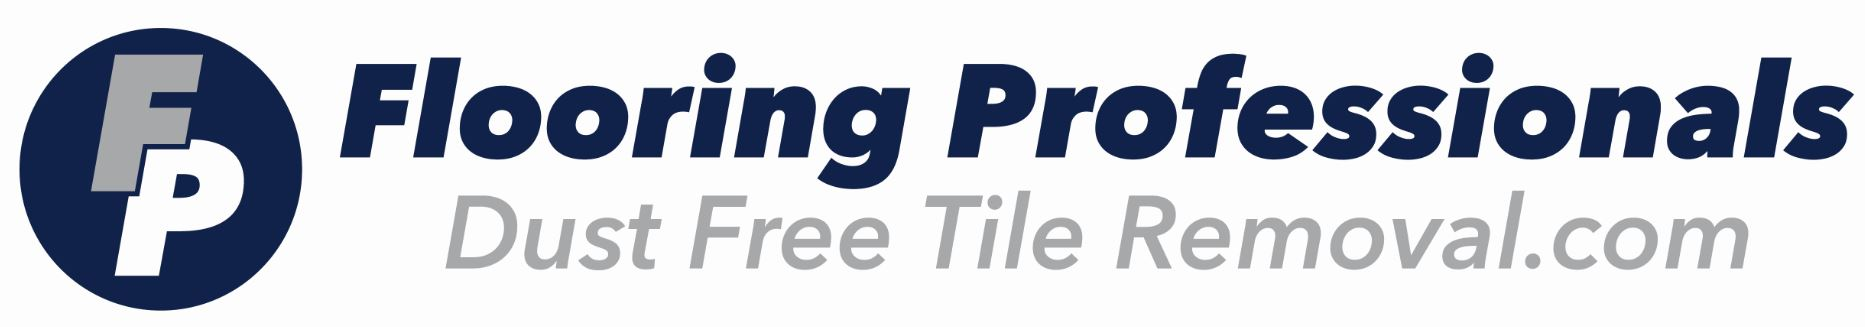 Flooring professionals phoenix tile removal company dustram system flooring professionals phoenix tile removal company jack king 2017 07 01t1017240000 tyukafo